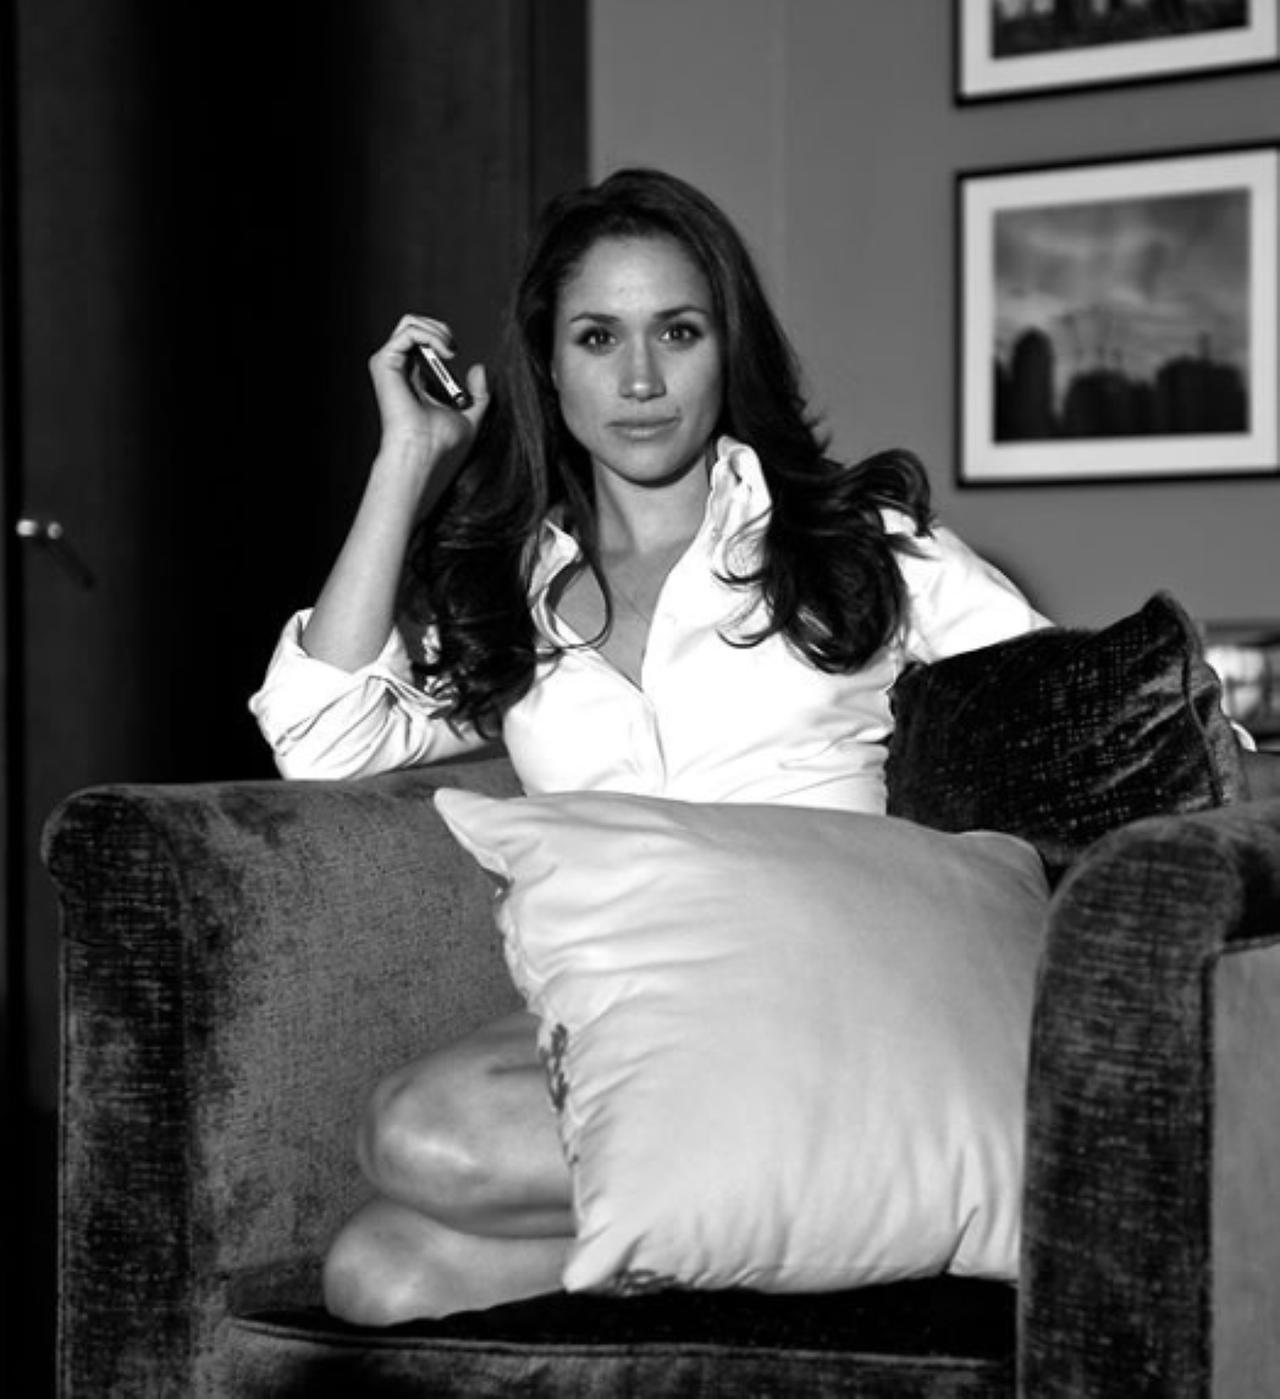 Images : 4番目の画像 - メーガン妃が床に寝っ転がる!バスローブ姿になる!俳優仲間がお宝写真を大量公開 - フロントロウ -海外セレブ情報を発信